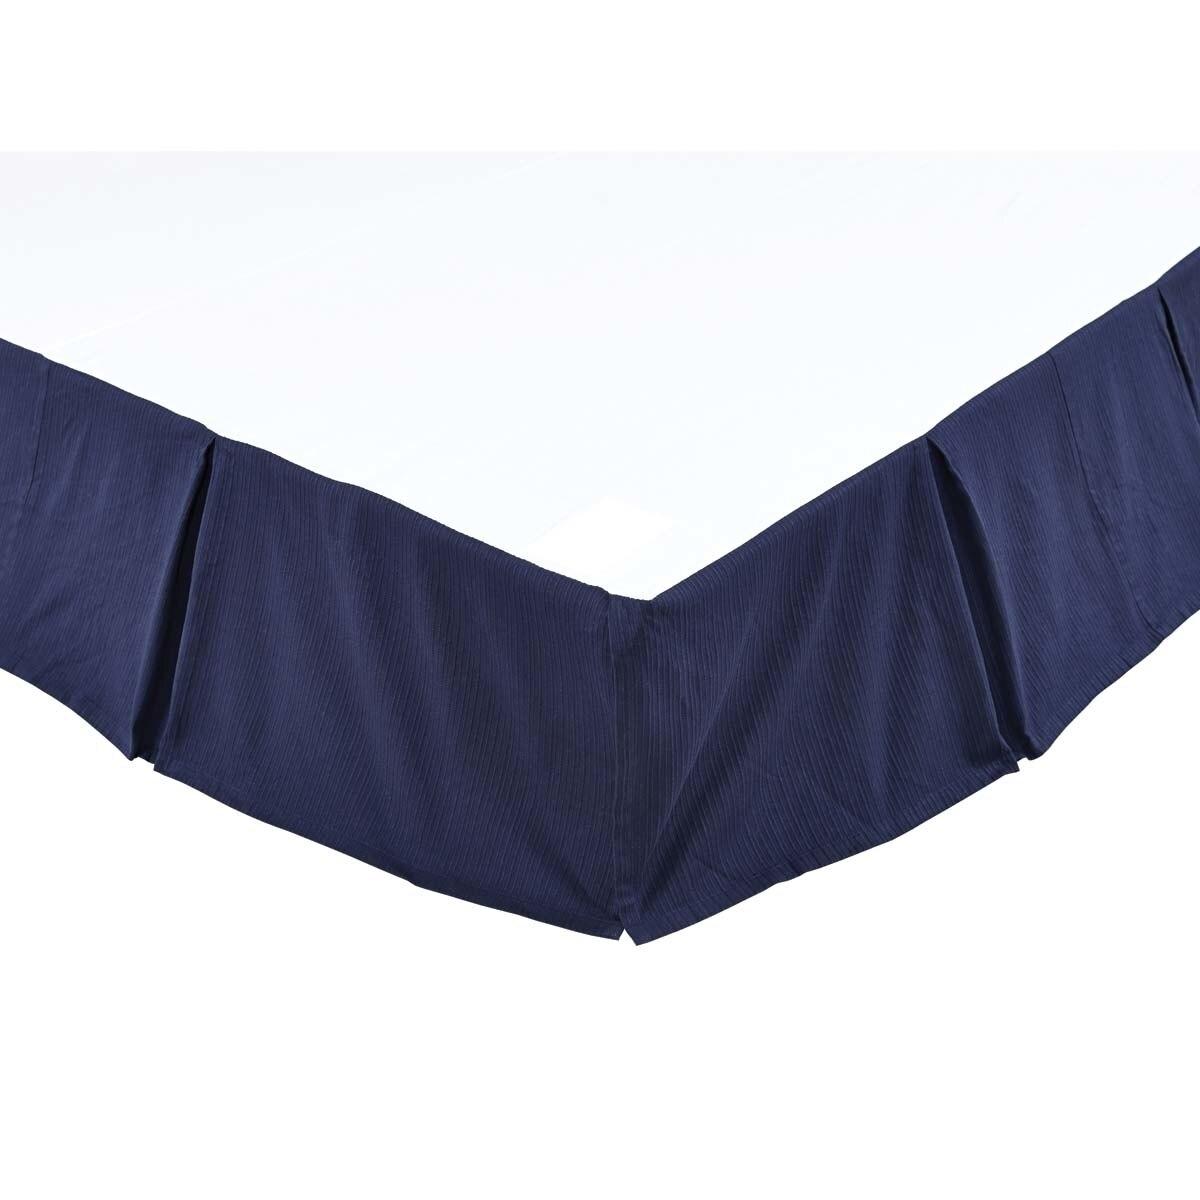 Farmhouse Bedding Carter Blue Bed Skirt